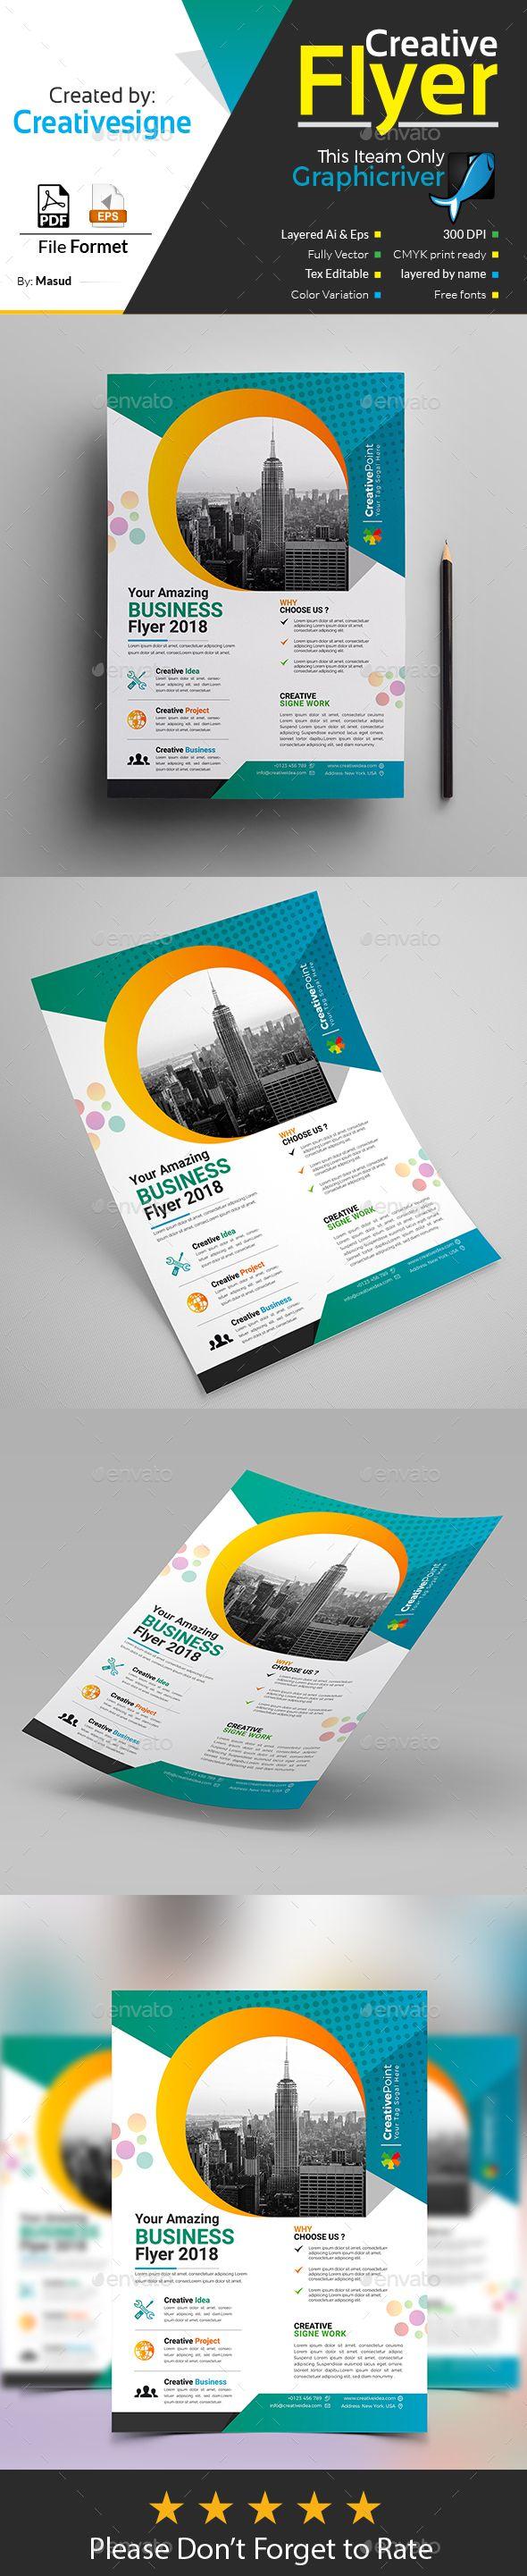 Business Flyer Template Vector EPS, AI Illustrator